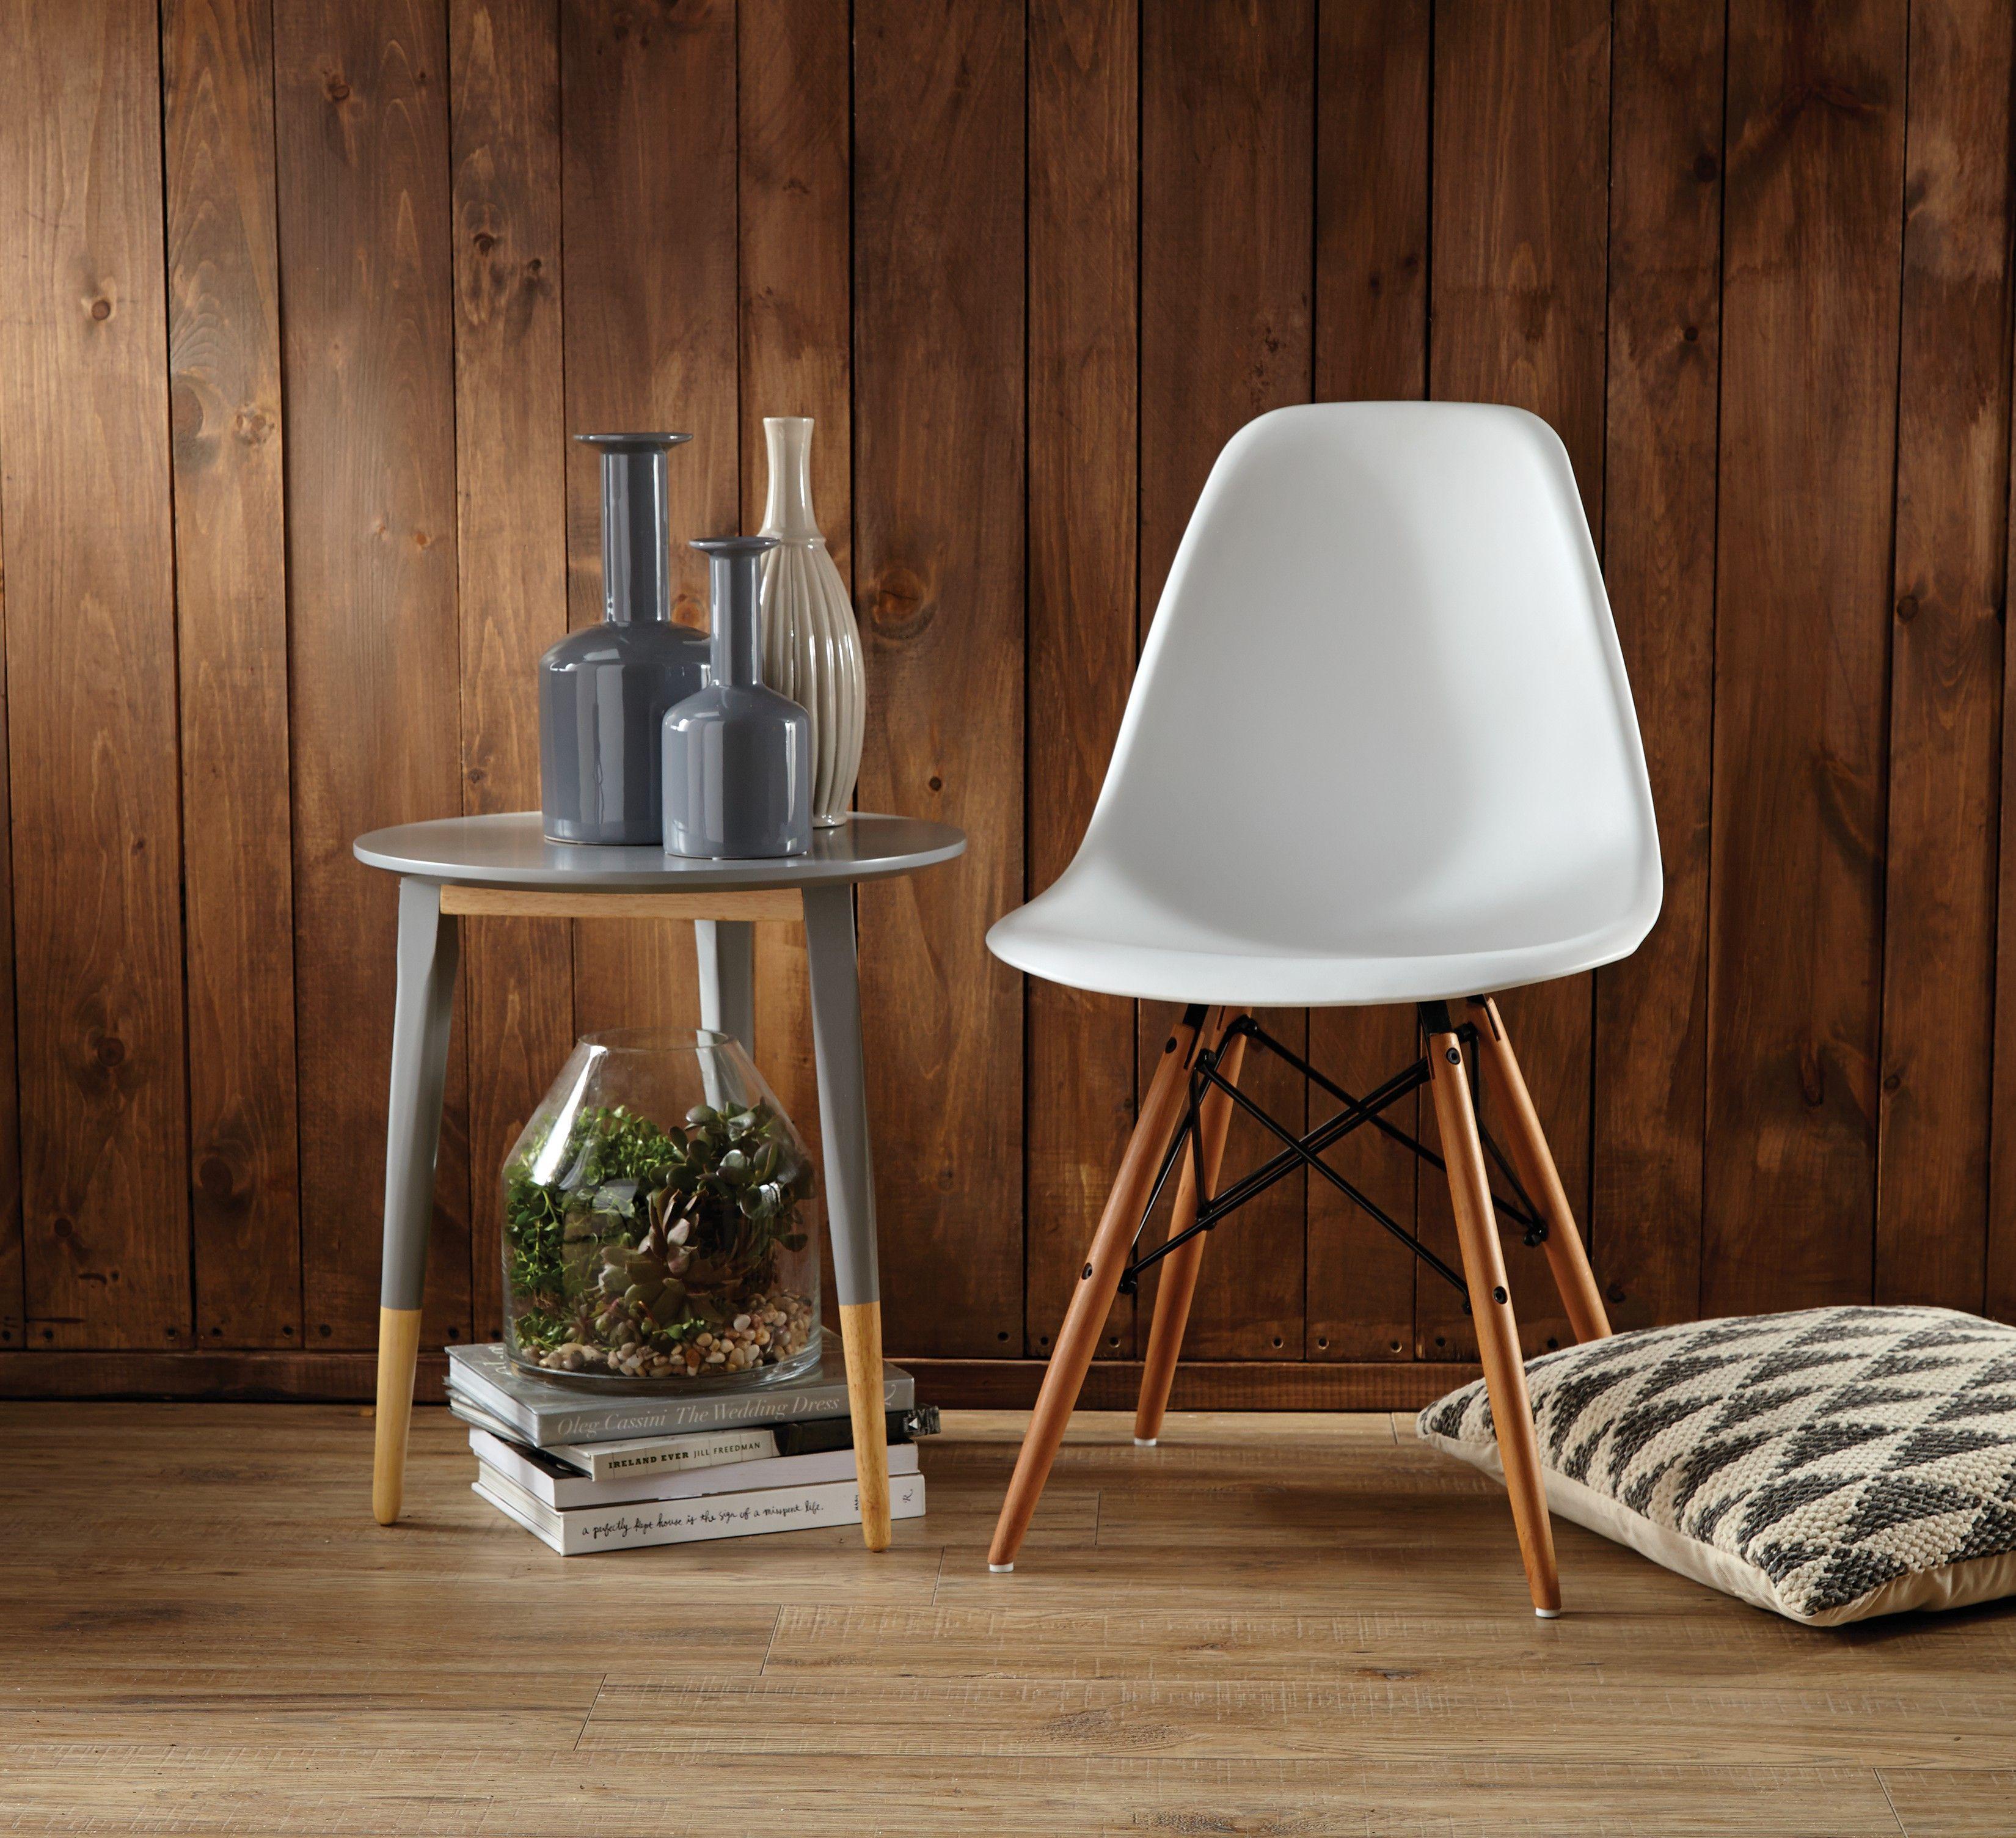 Floor mats canadian tire - Canadian Tire Retail Canvas Henrik Chair